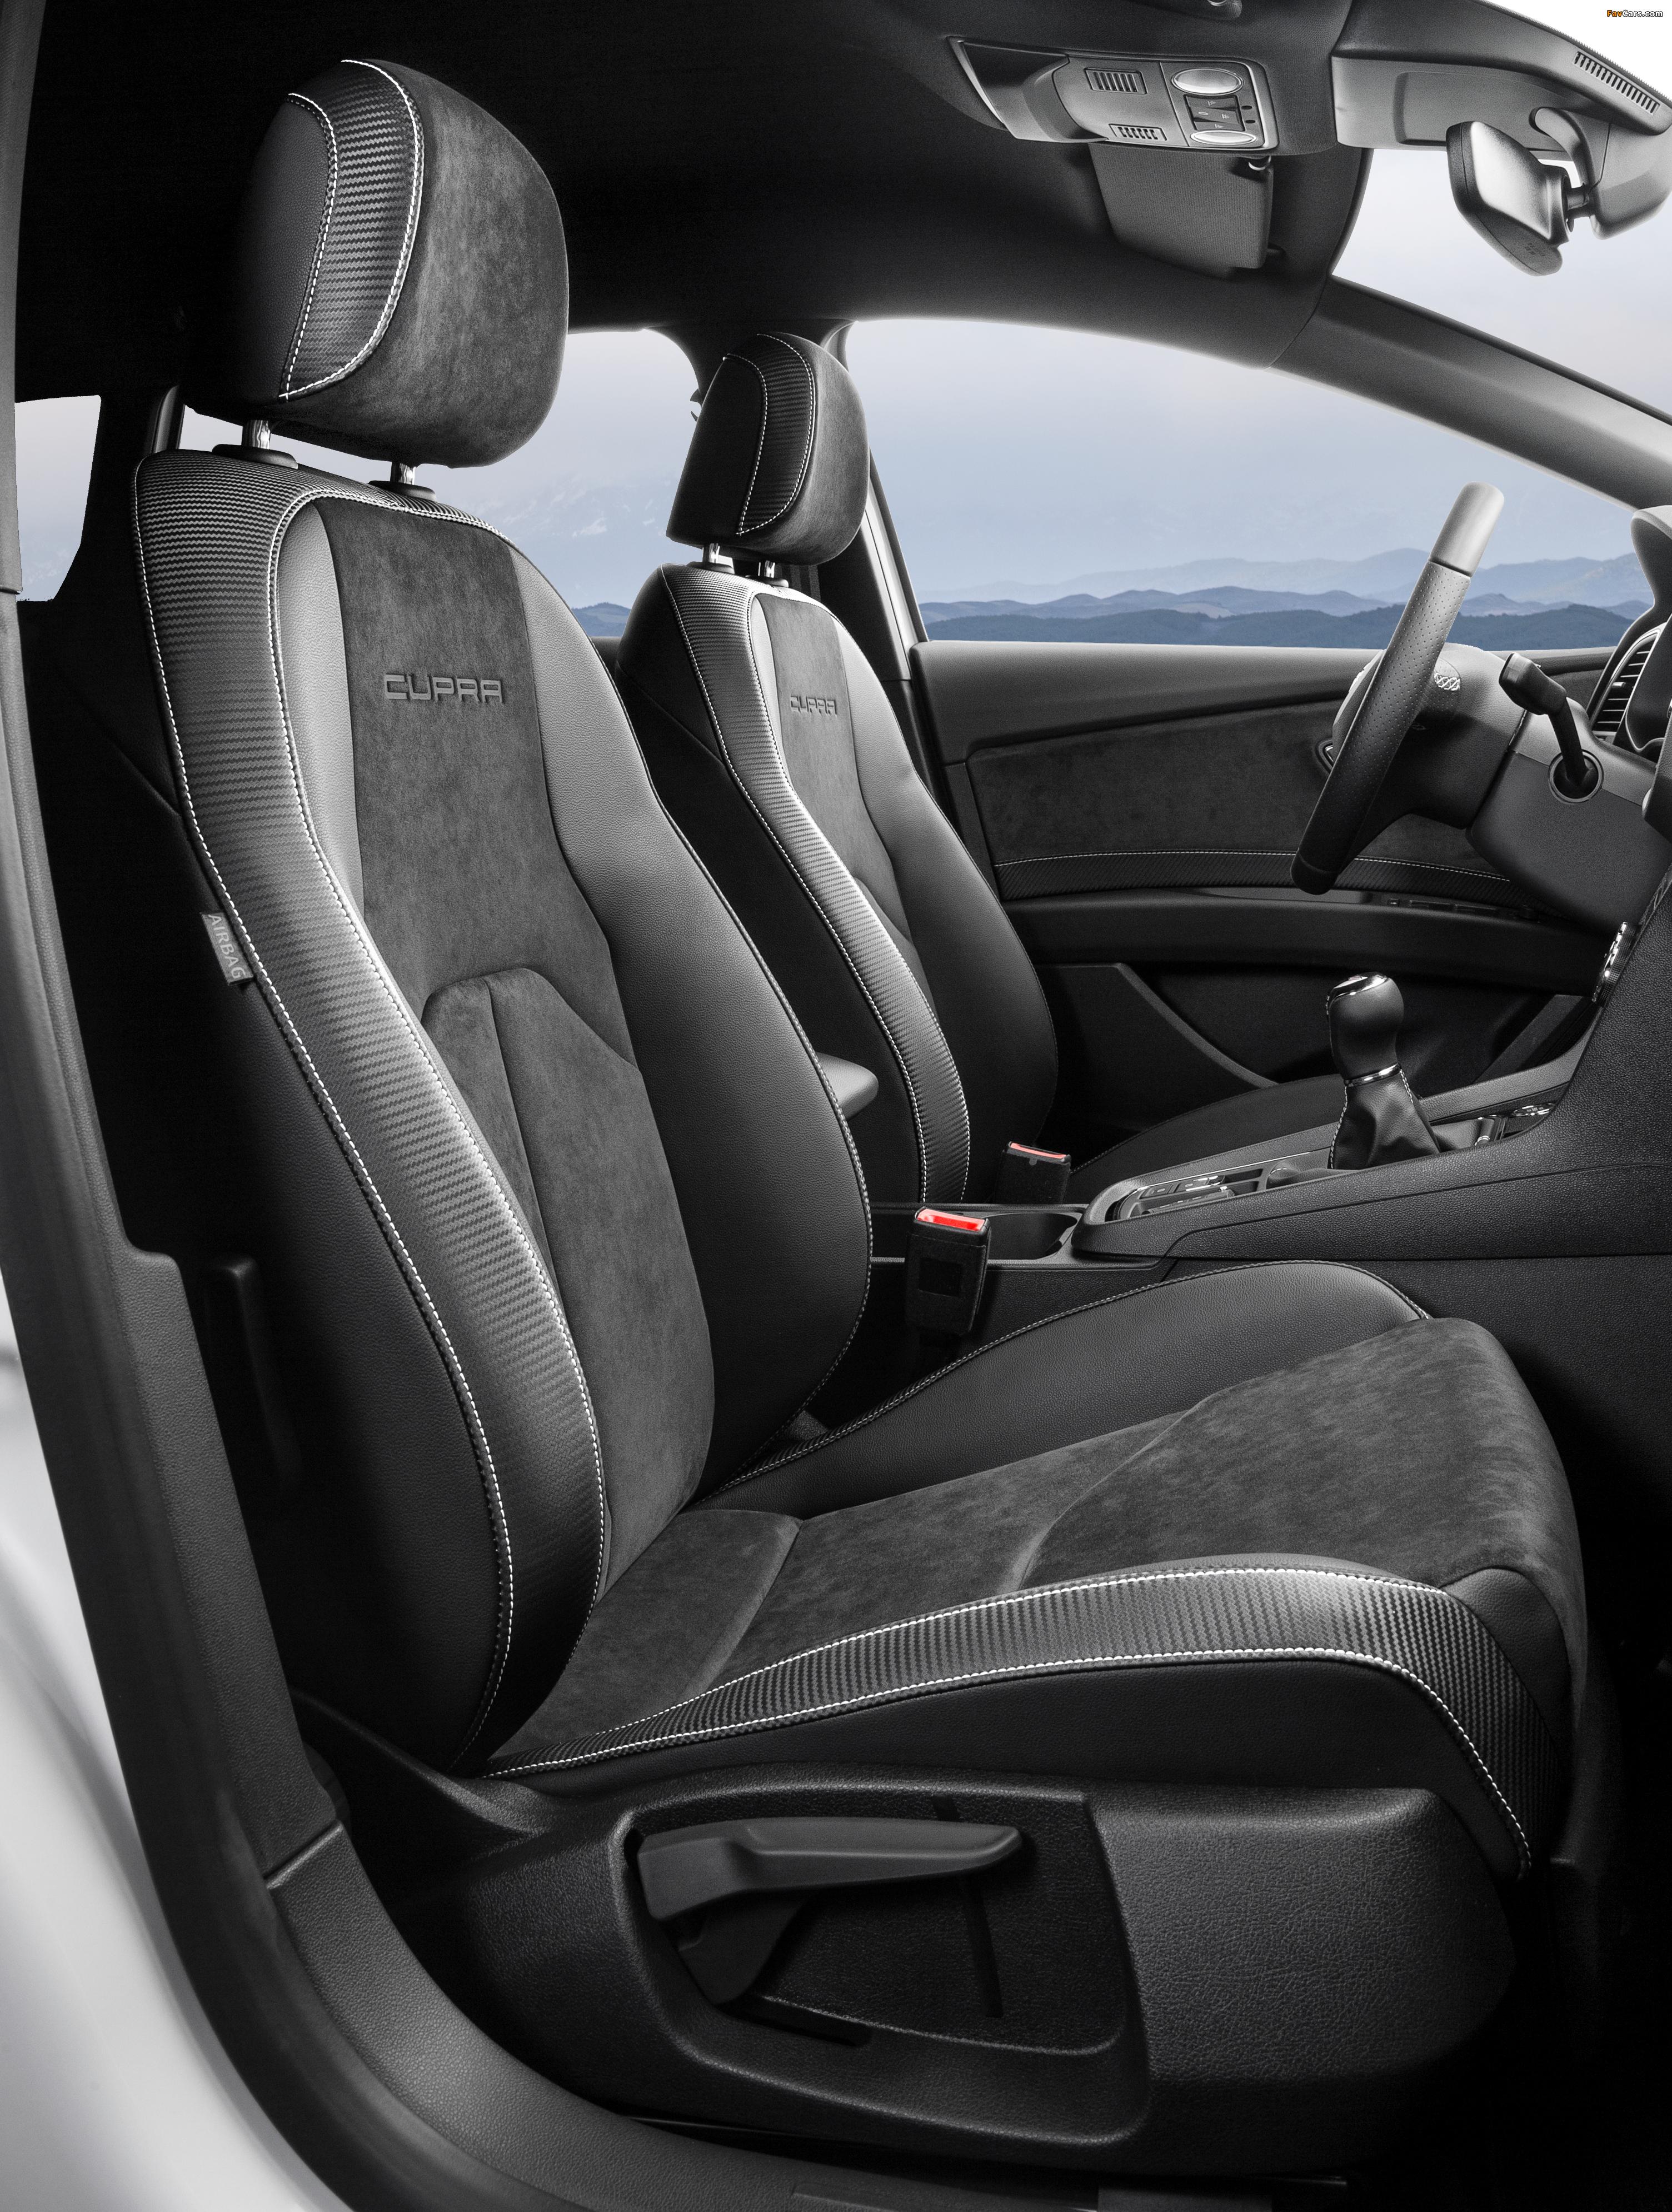 Seat León ST Cupra 300 (5F) 2017 pictures (3009 x 3981)